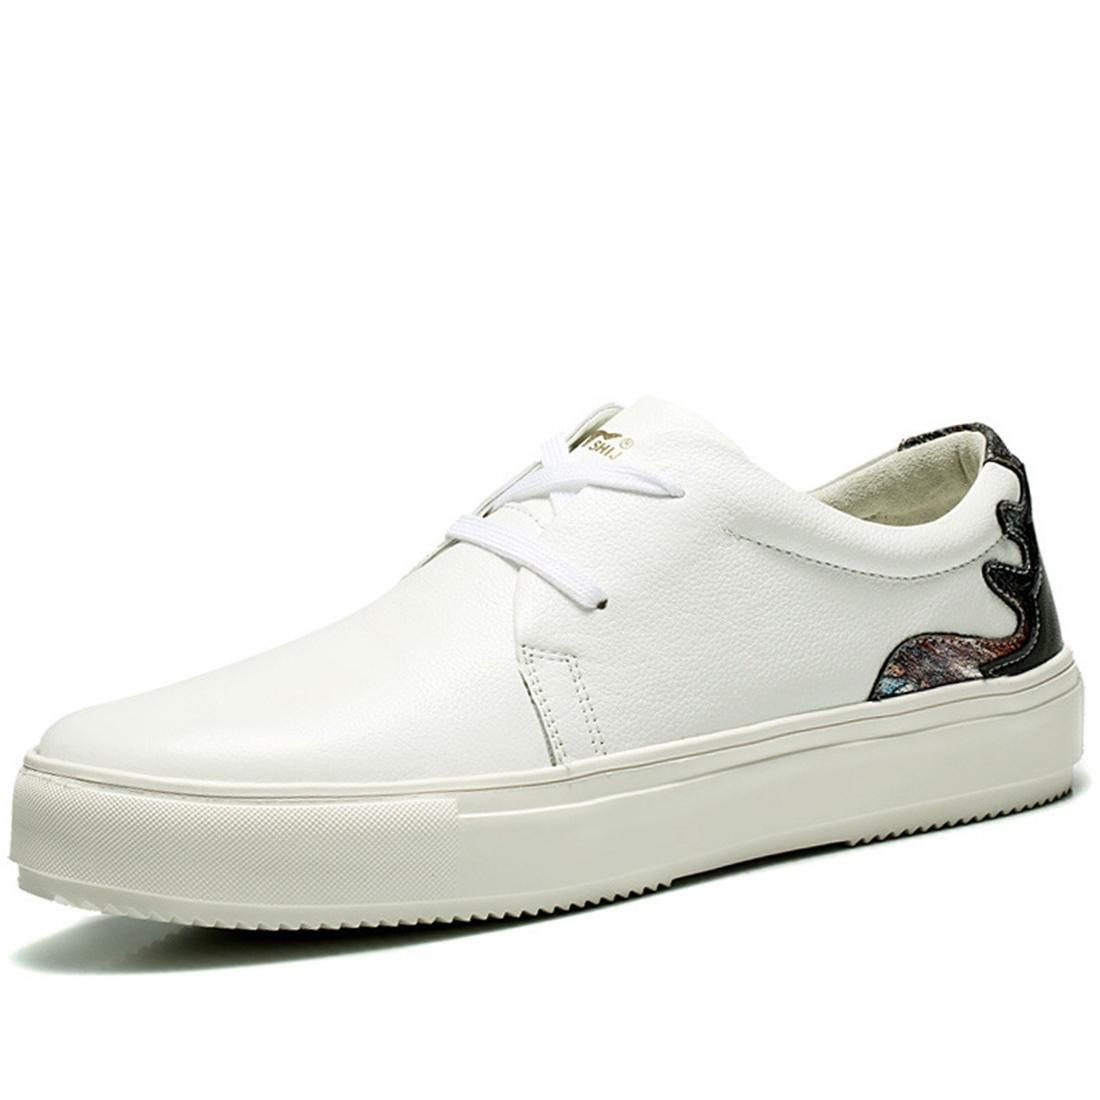 Herren Lässige Schuhe Mode Flache Schuhe Rutschfest Trainer Sportschuhe Schuhe erhöhen Draussen EUR GRÖSSE 38-44